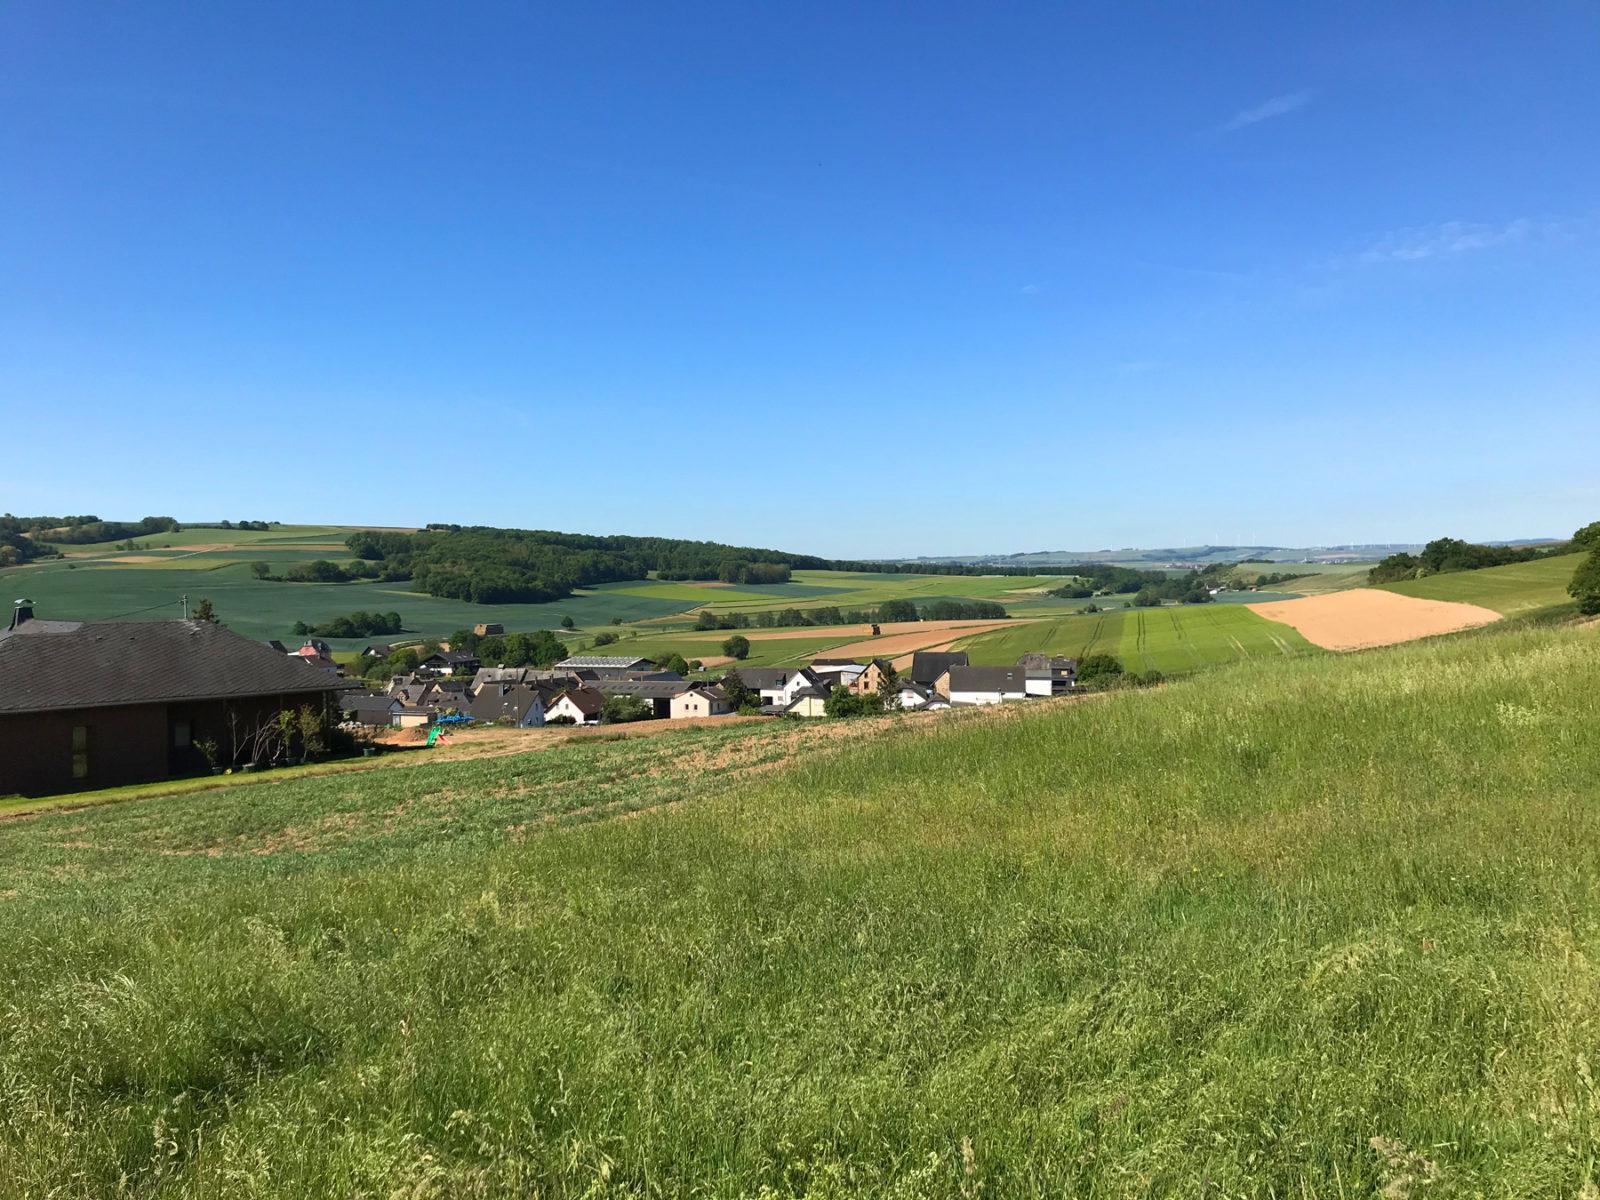 Traumhafter Keberbach, Carlshöhe und sonniges Maifeld